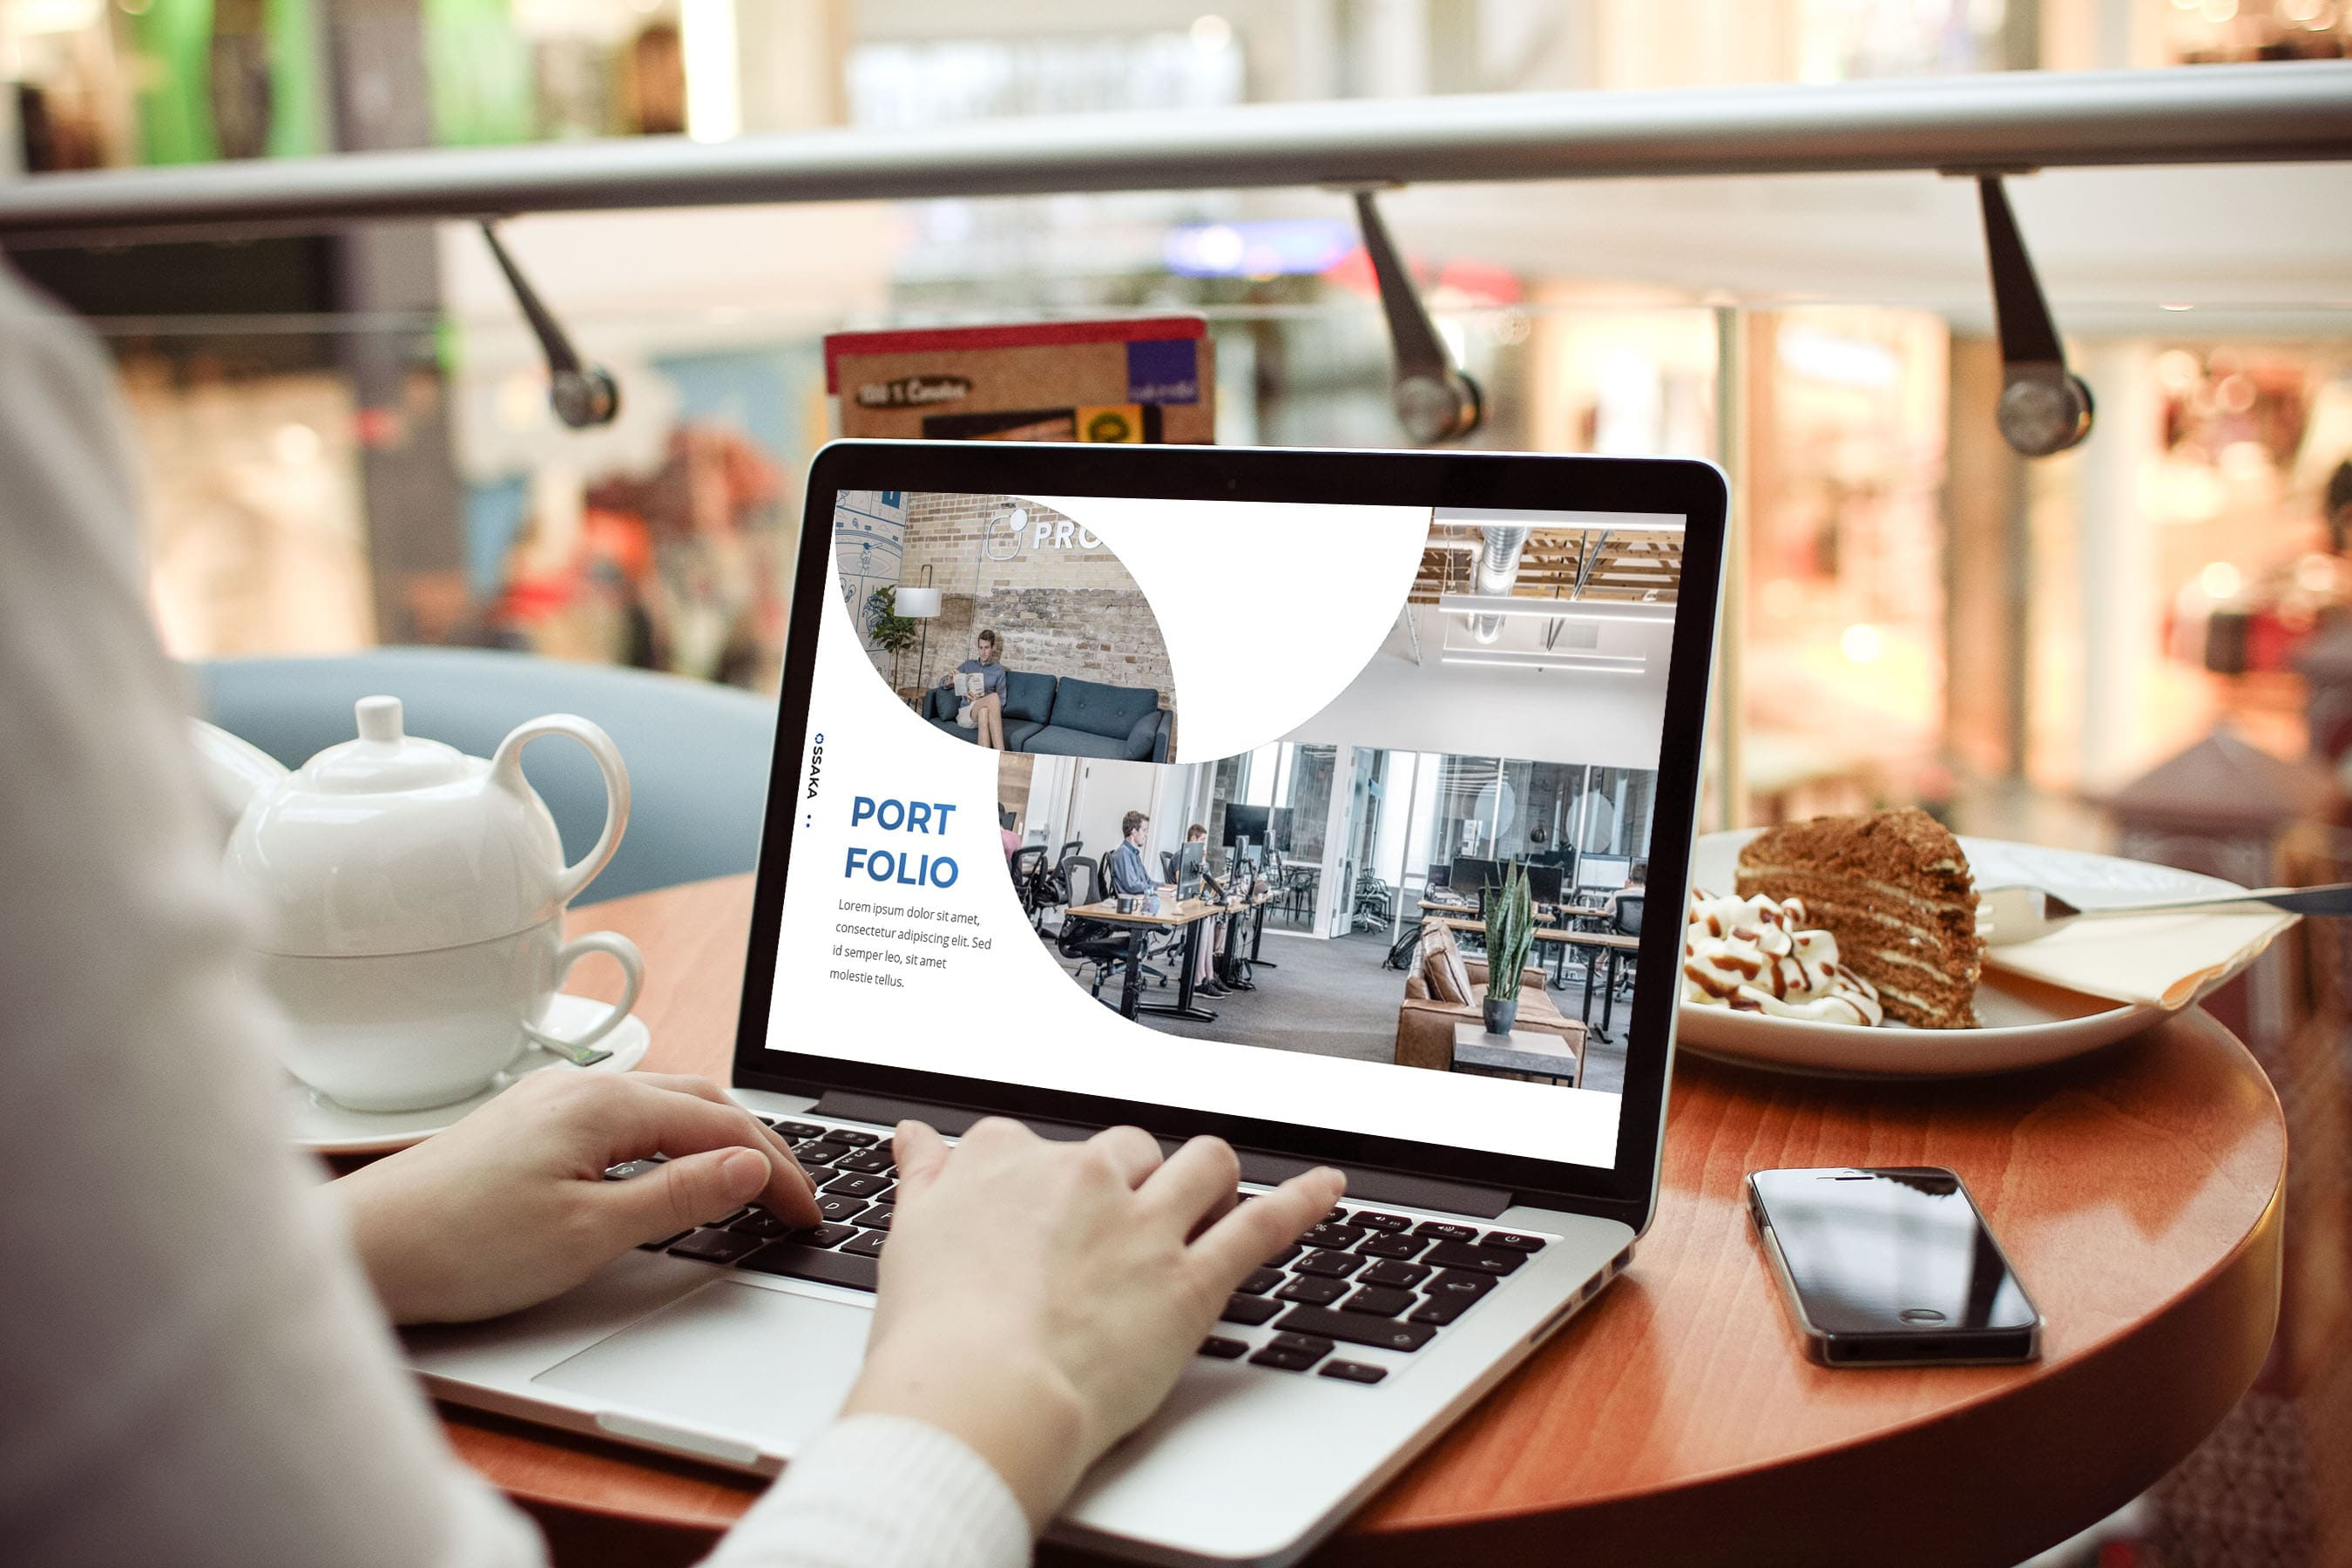 Business Presentationon by MasterBundles notebook preview mockup image.